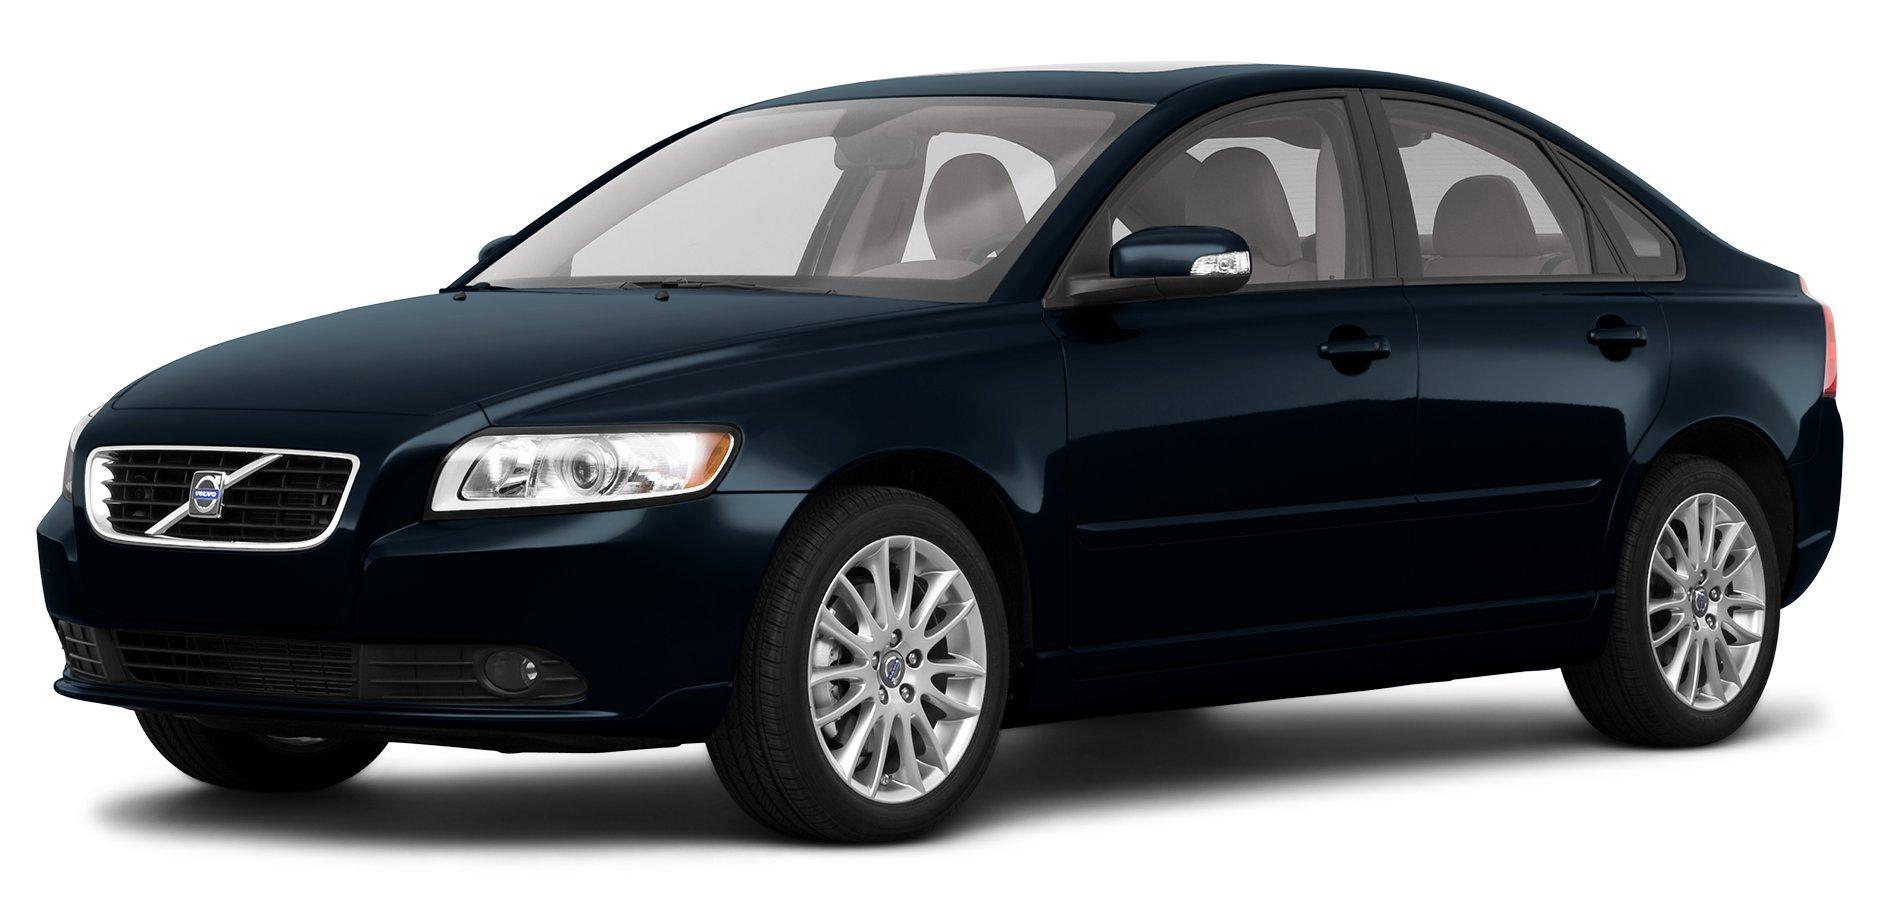 ... 2010 Volvo S40, 4-Door Sedan Automatic Transmission Front Wheel Drive  ...